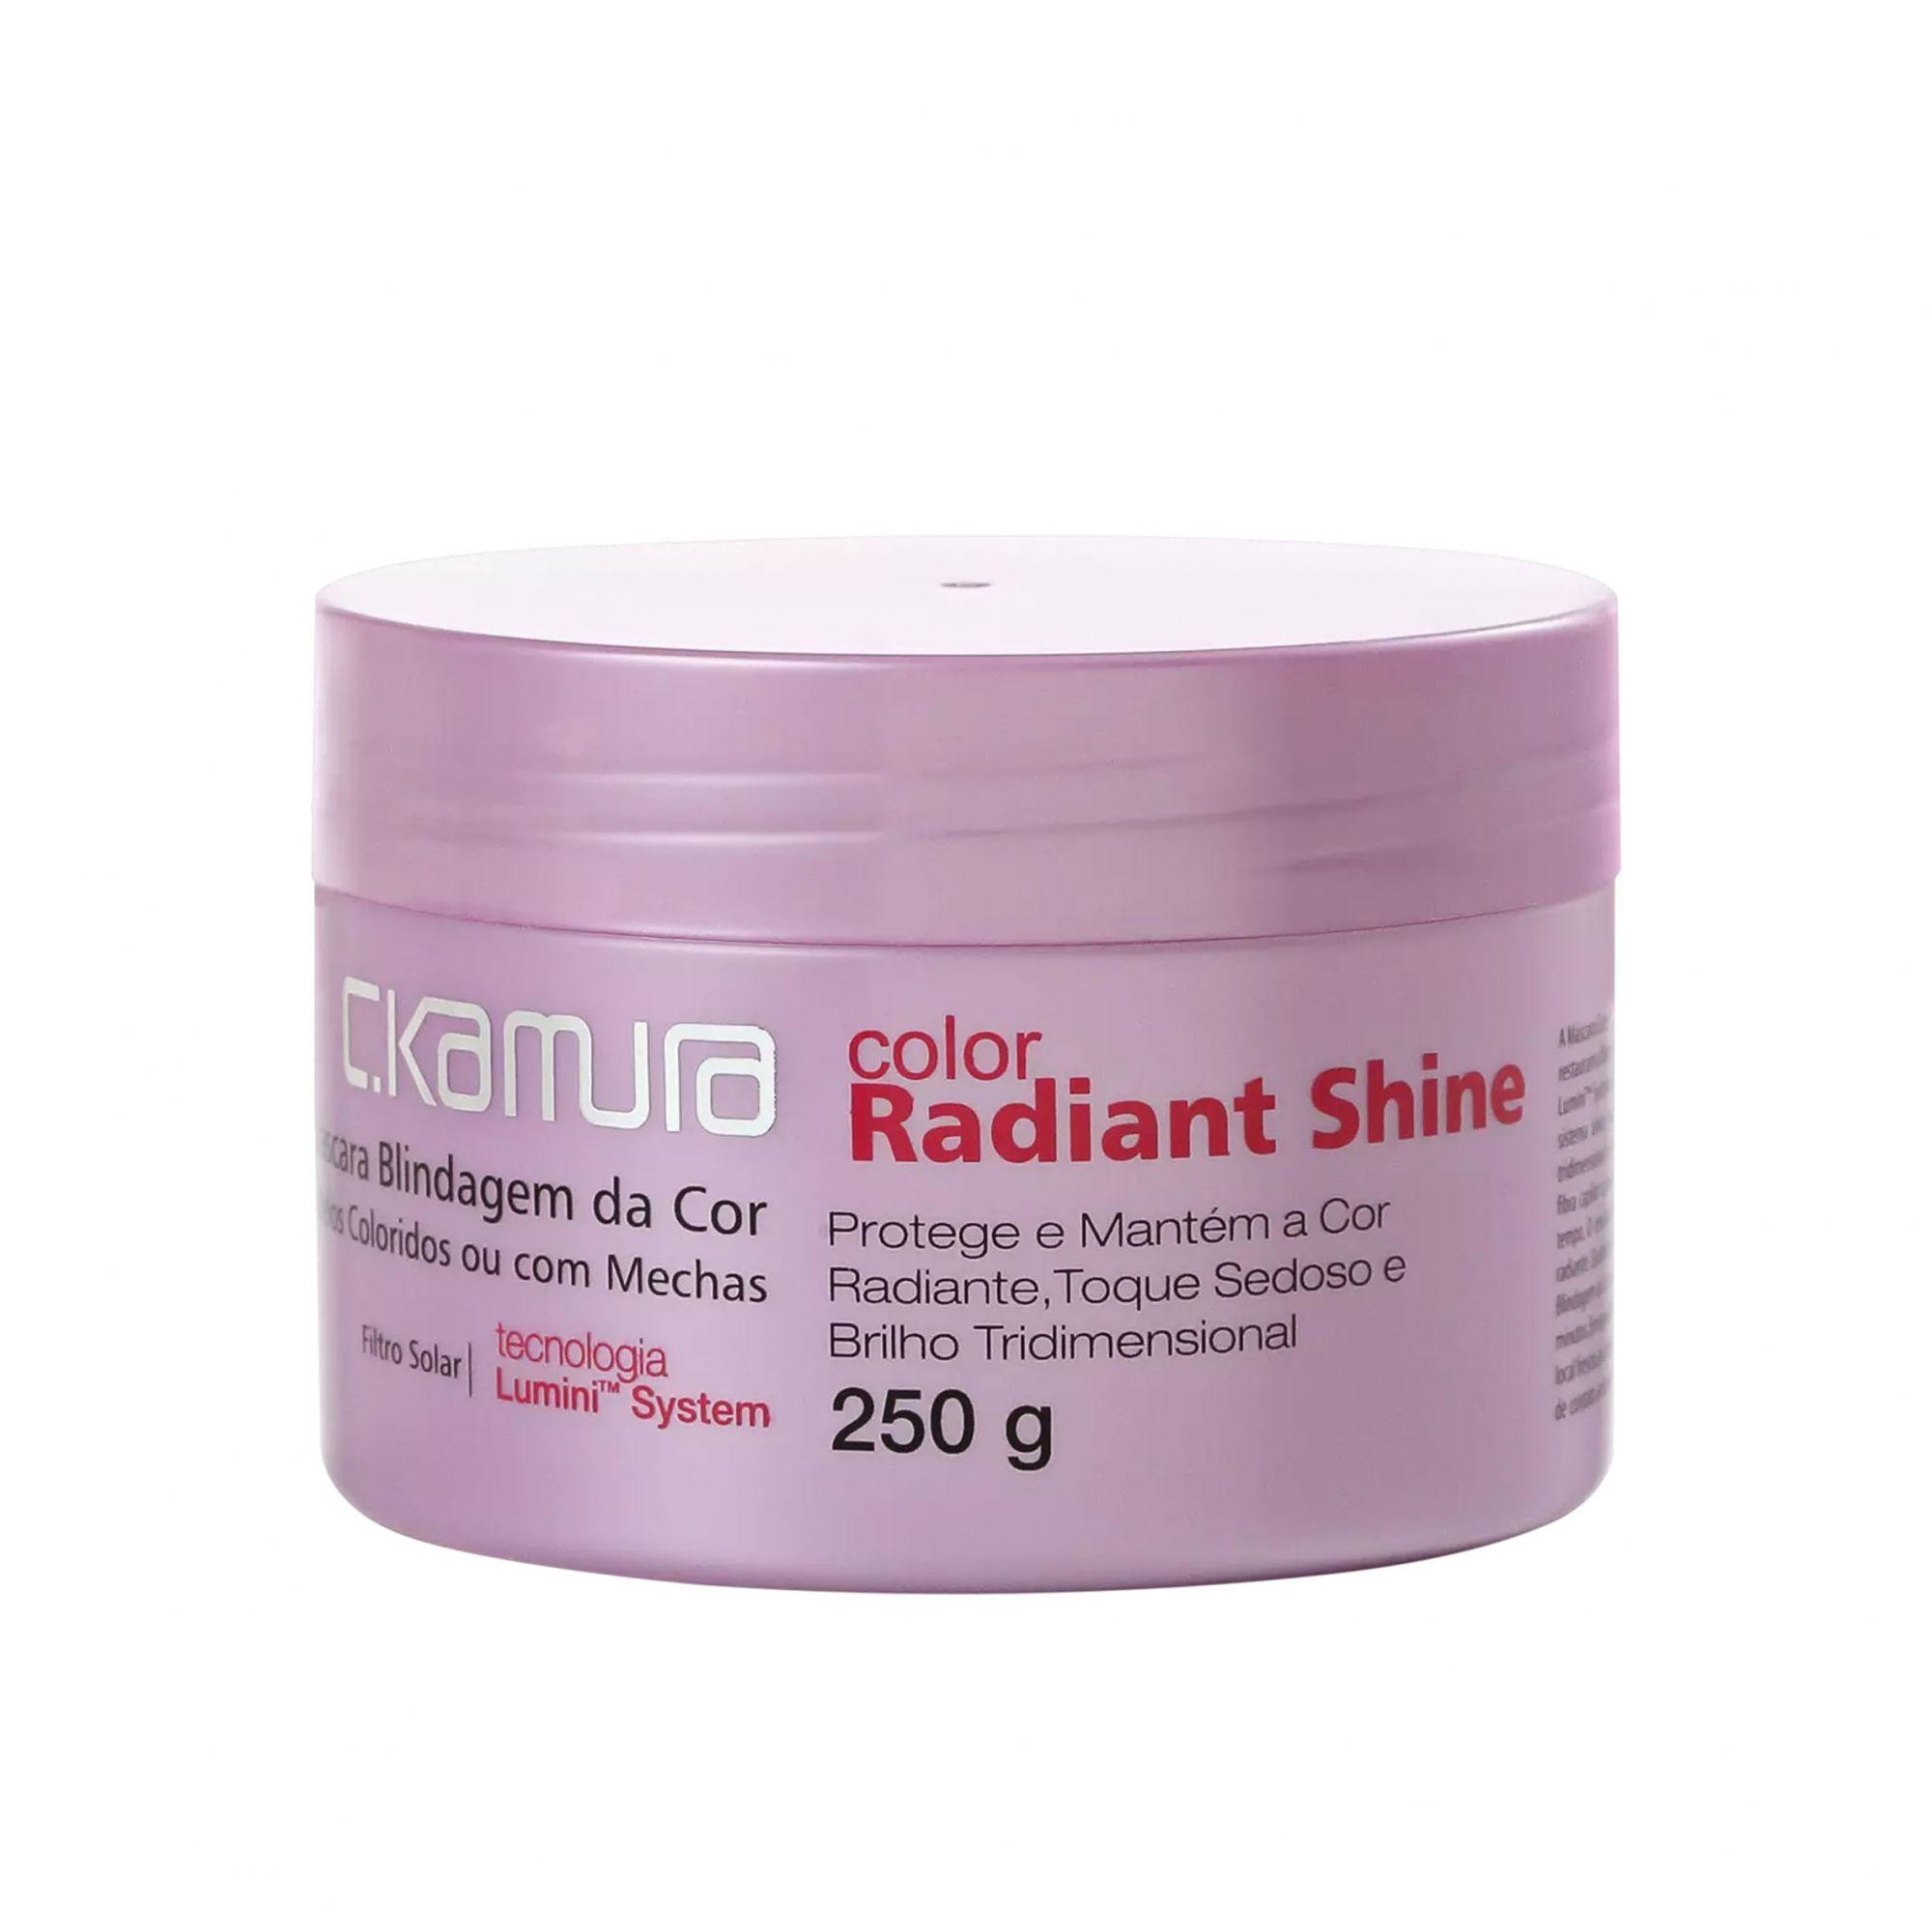 C.Kamura Color Radiant Shine Máscara Capilar 250g.